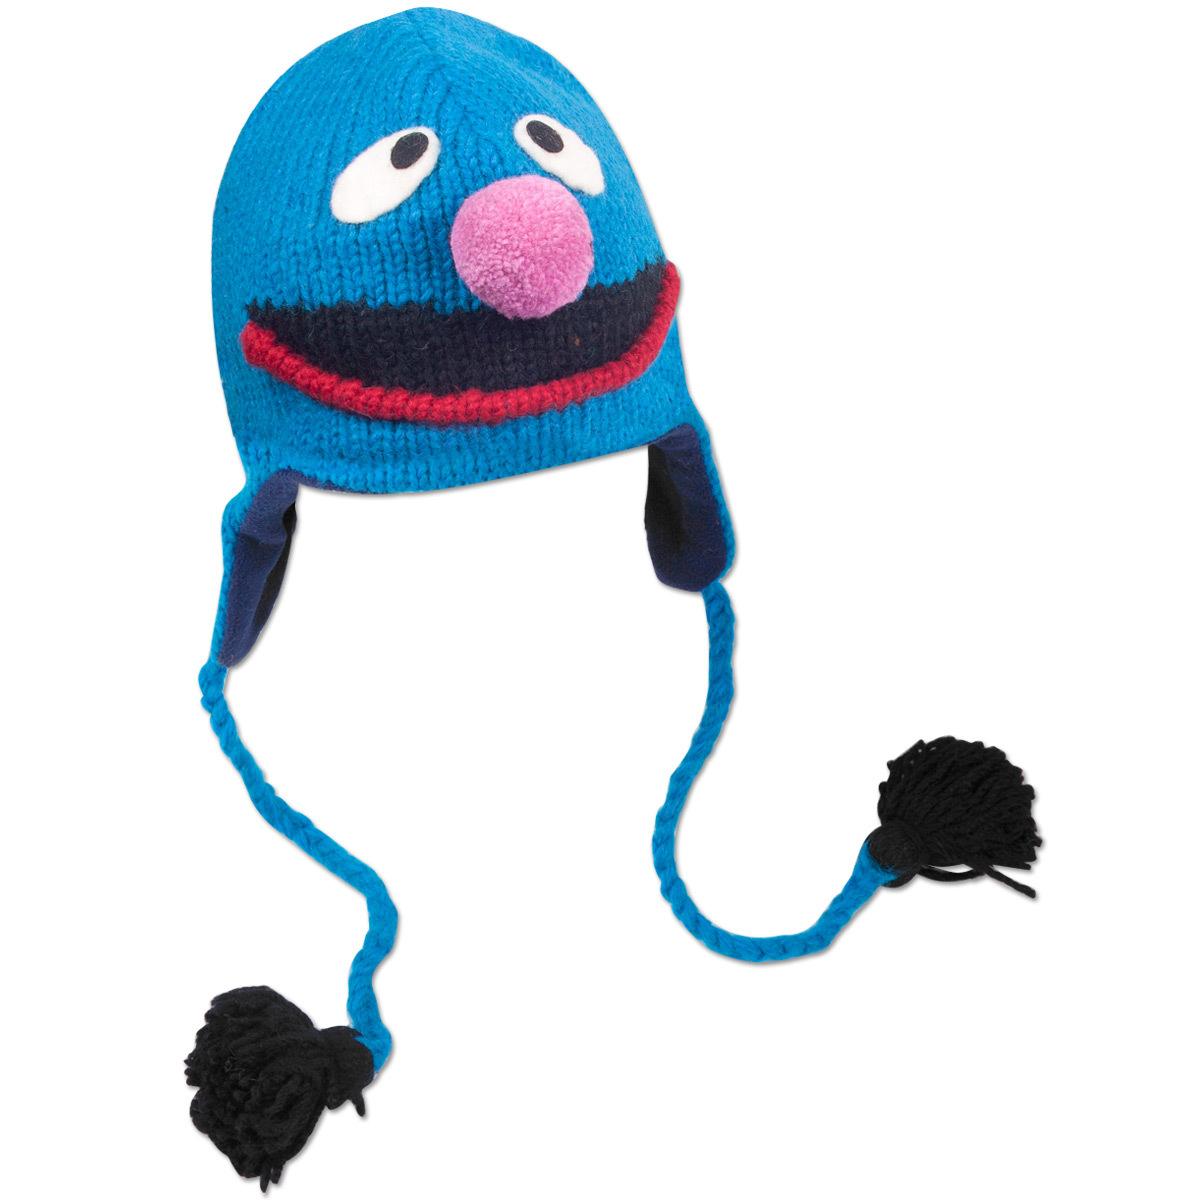 Grover Adult Pilot Hat